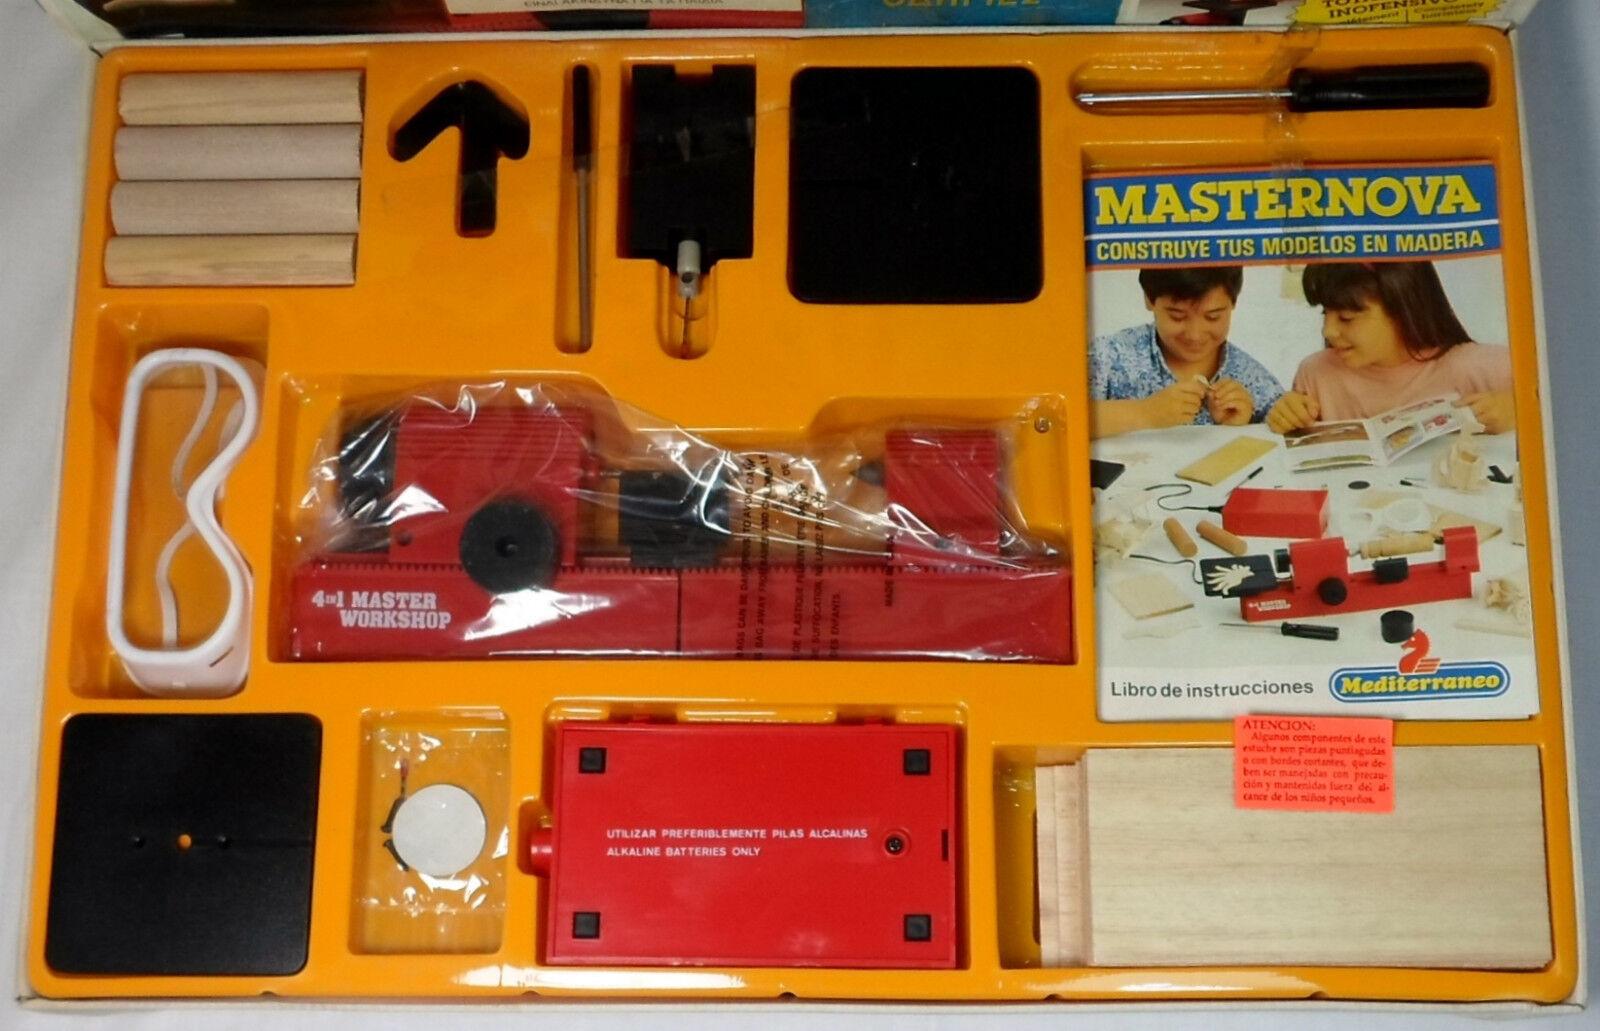 HASBRO 90's MEDITERRANEO MASTERNOVA WOOD MODELS MODELS MODELS WORKSHOP EDUCATIONAL GAME MIB 5c67f0